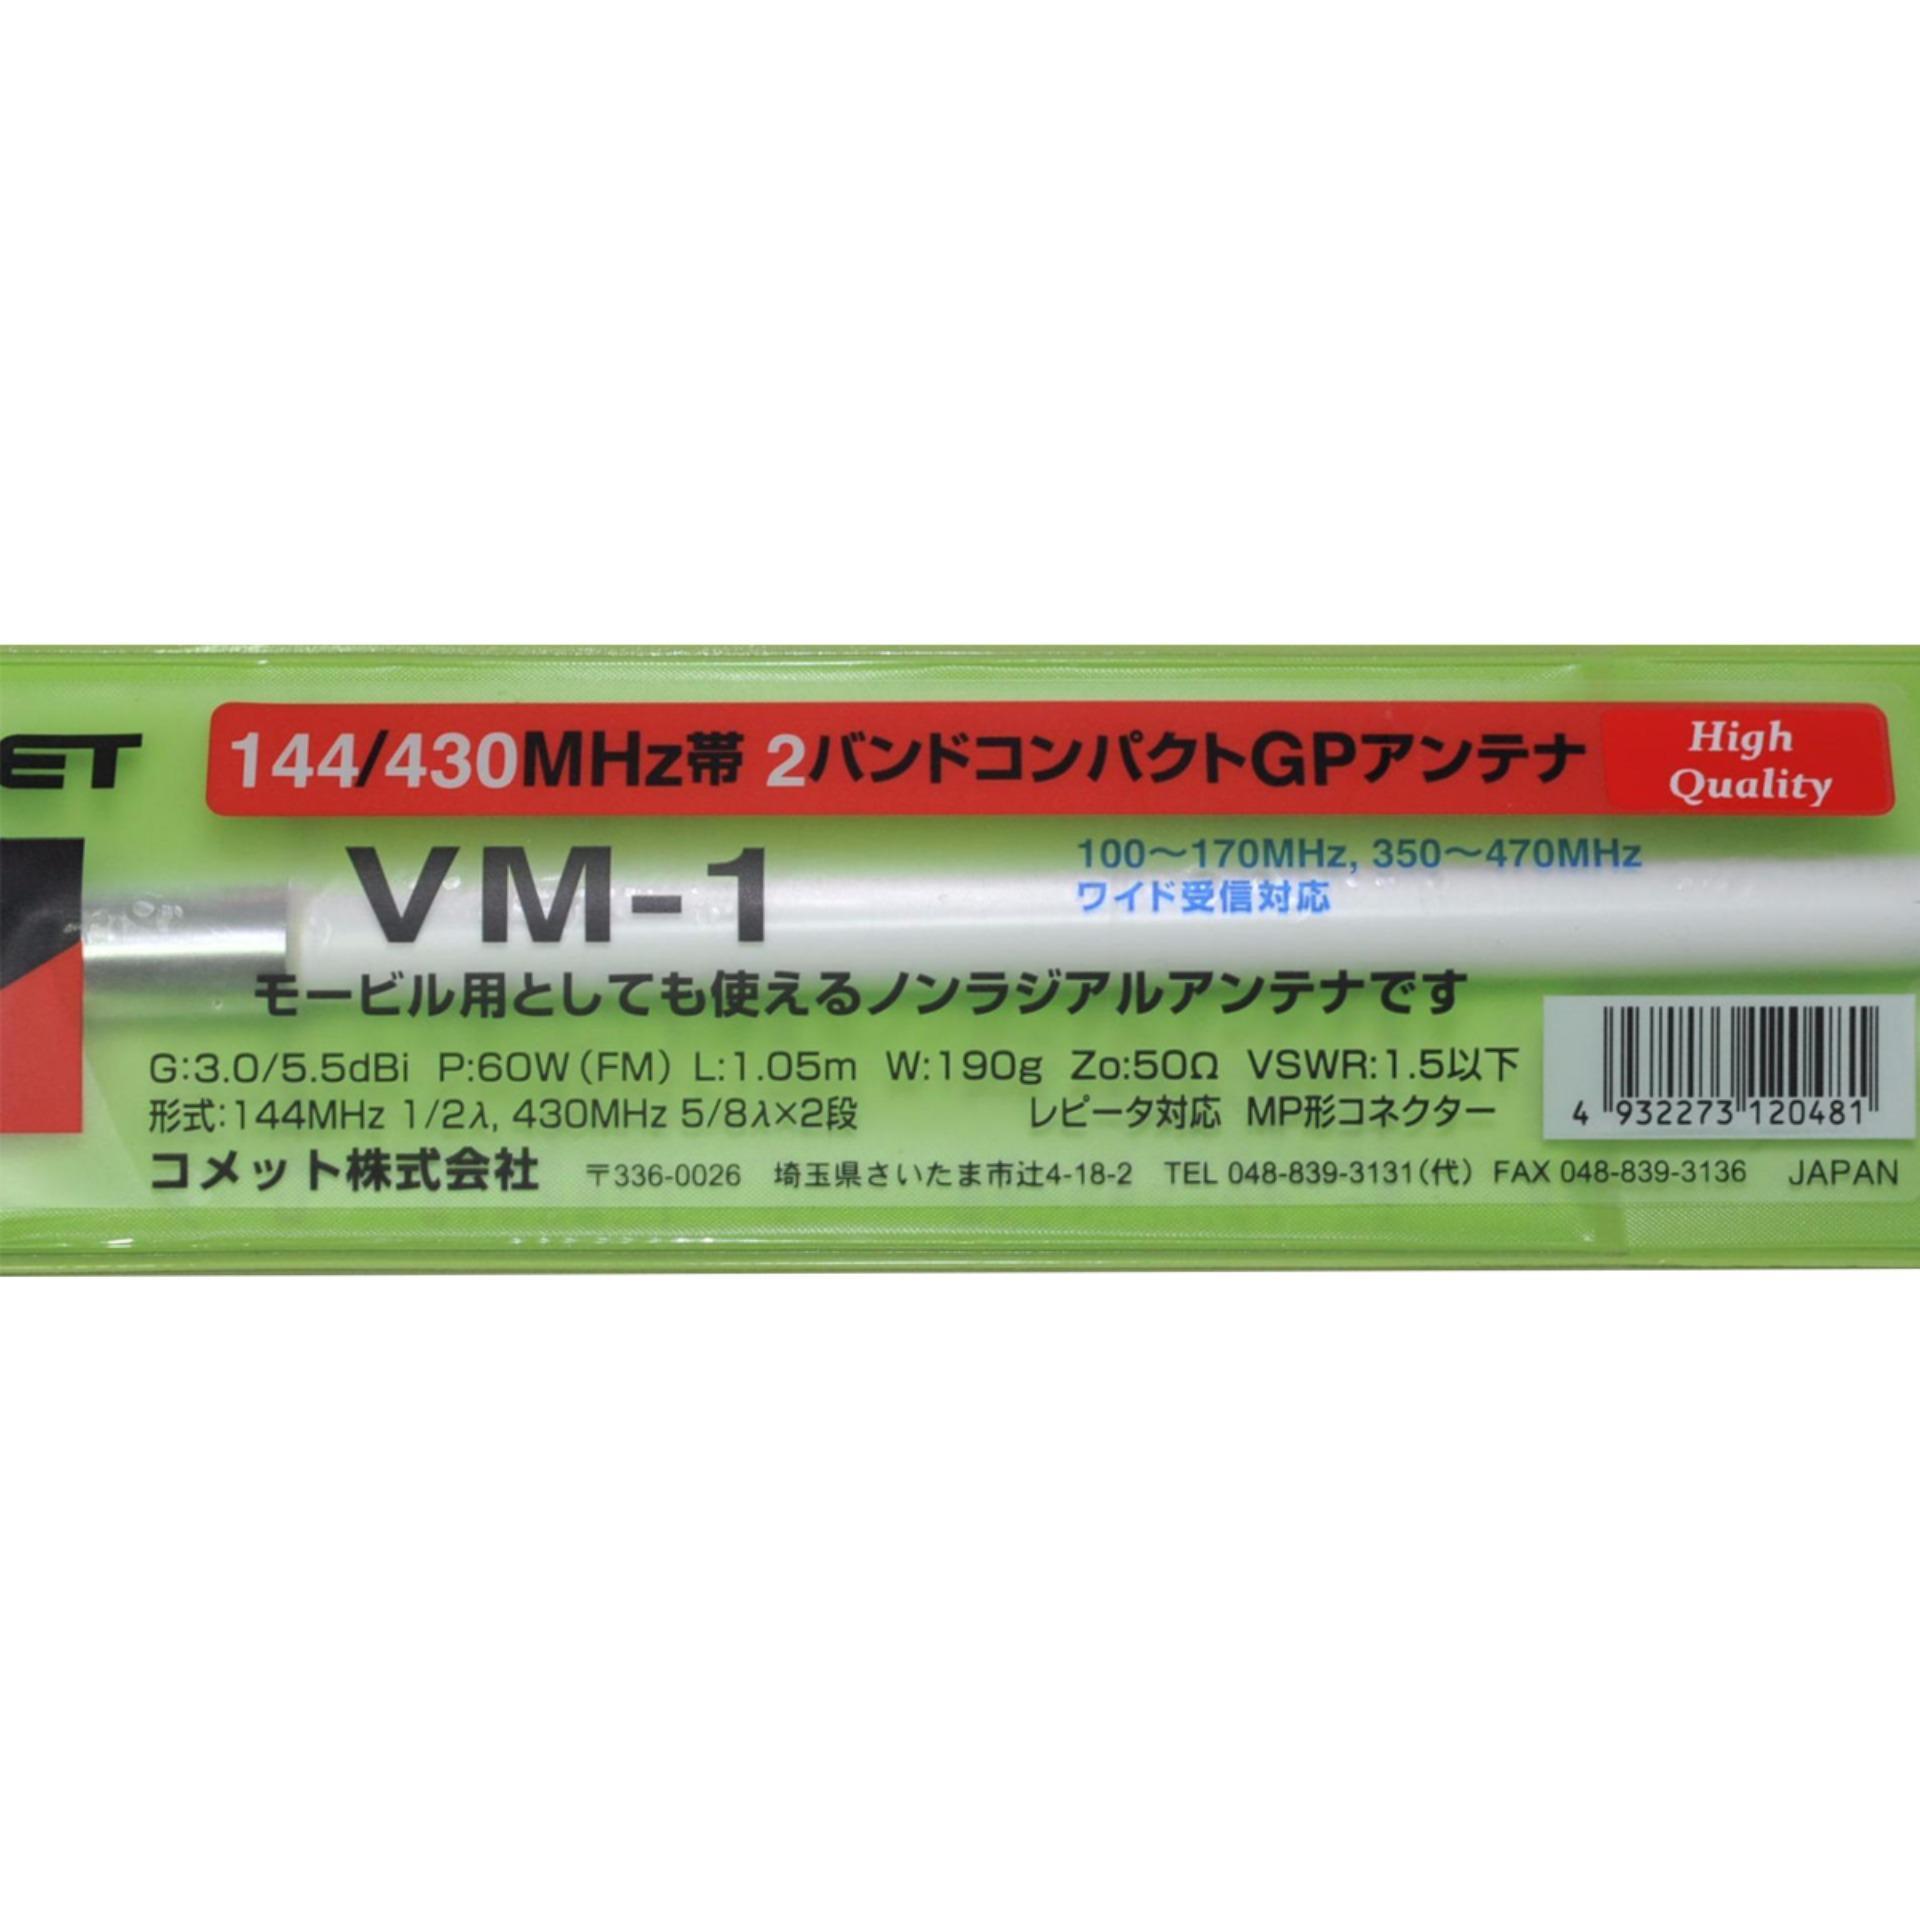 COMET VM-1 DUAL BAND MOBILE ANTENNA